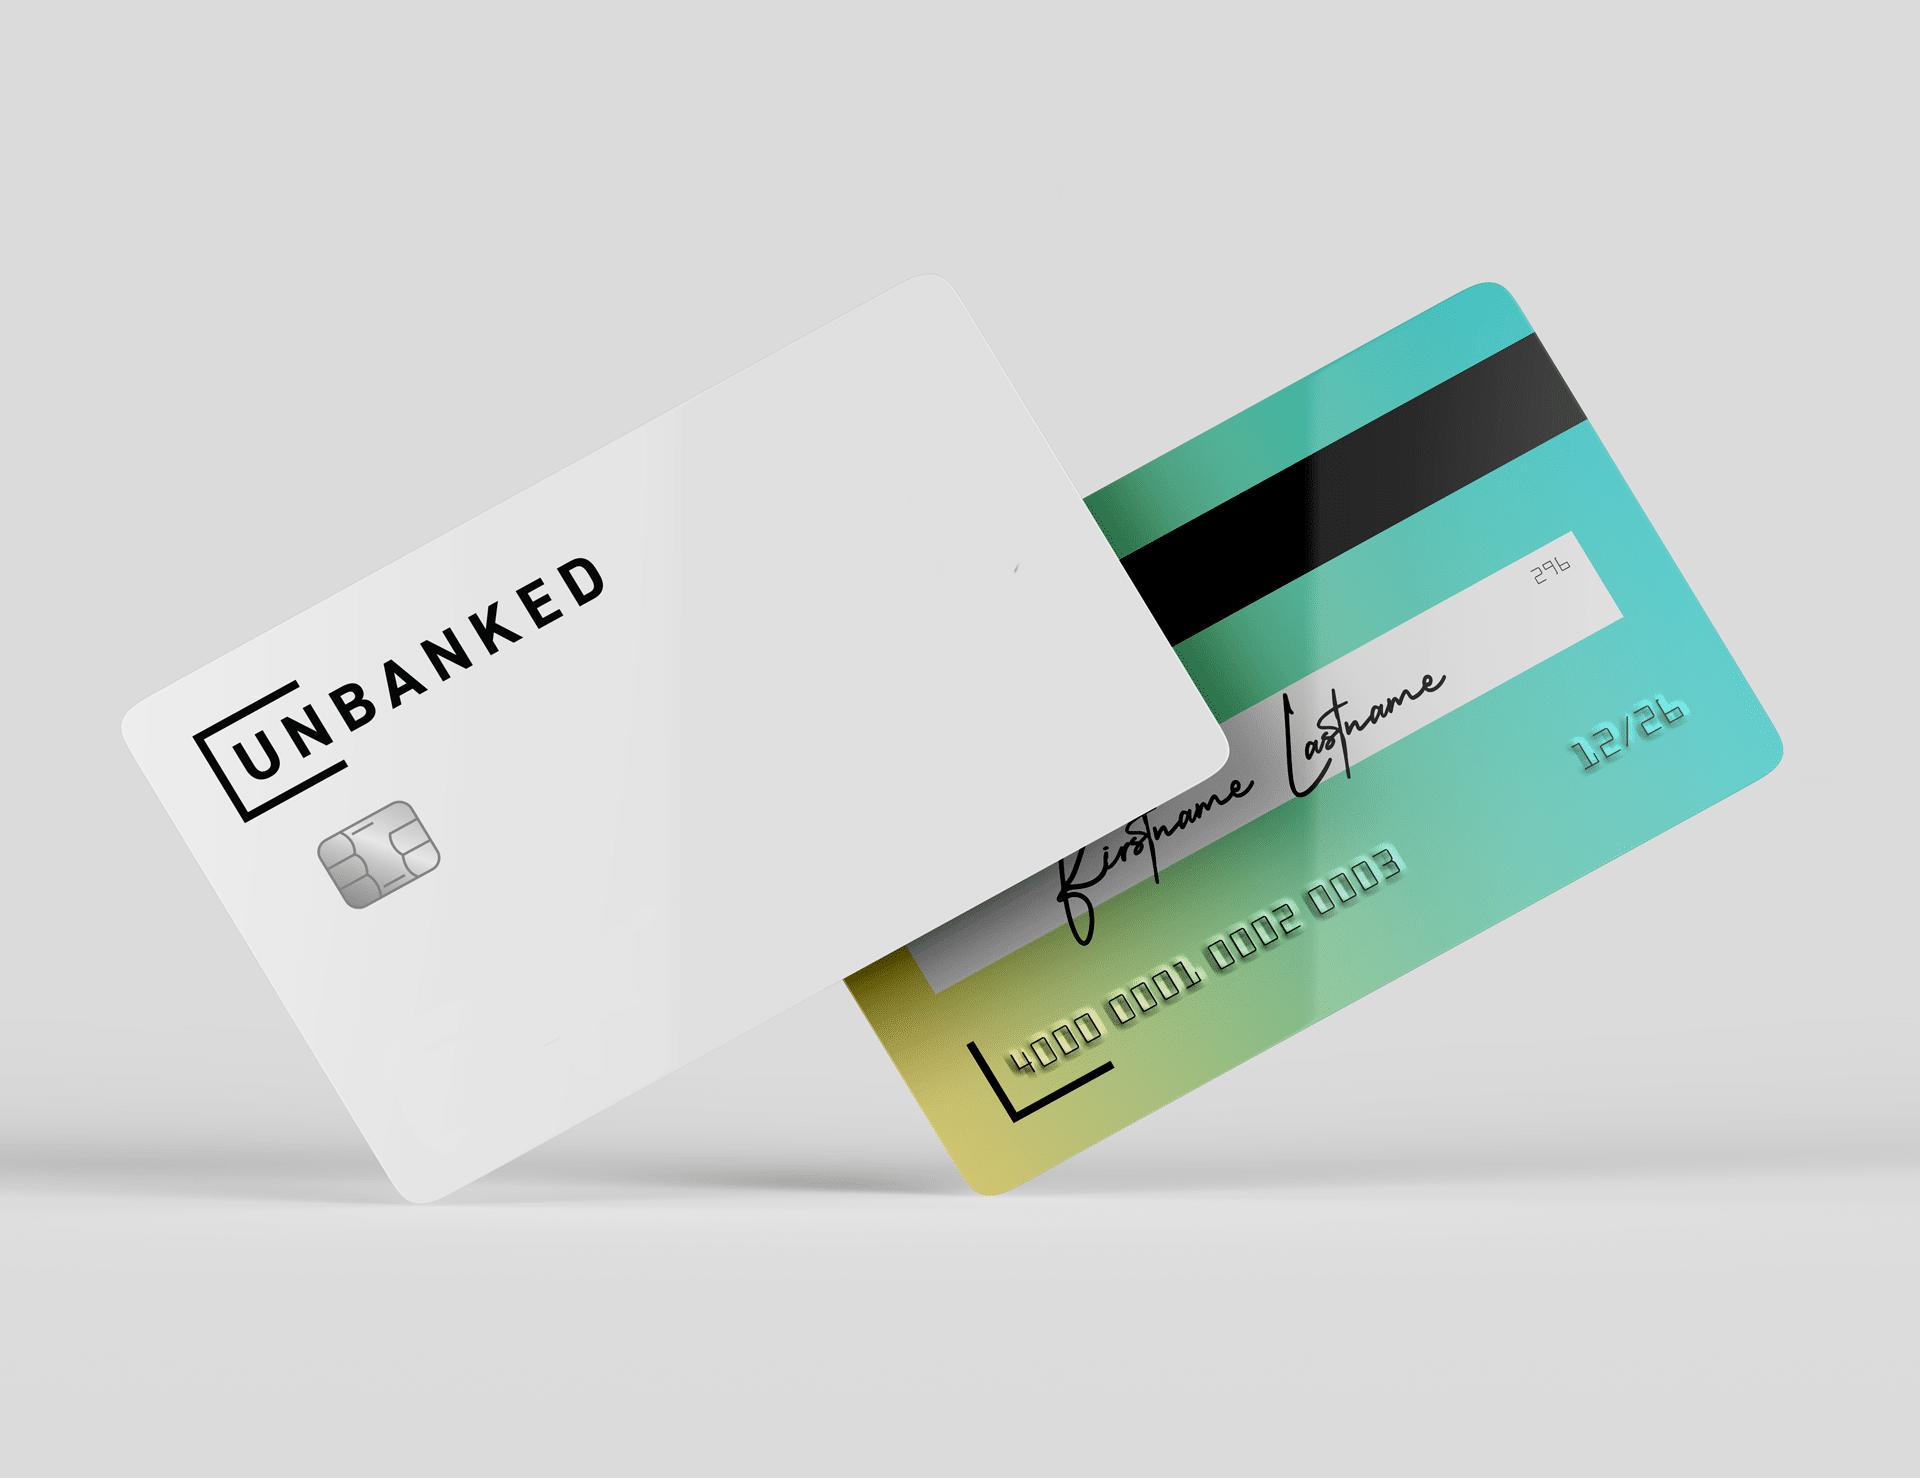 Unbanked Card